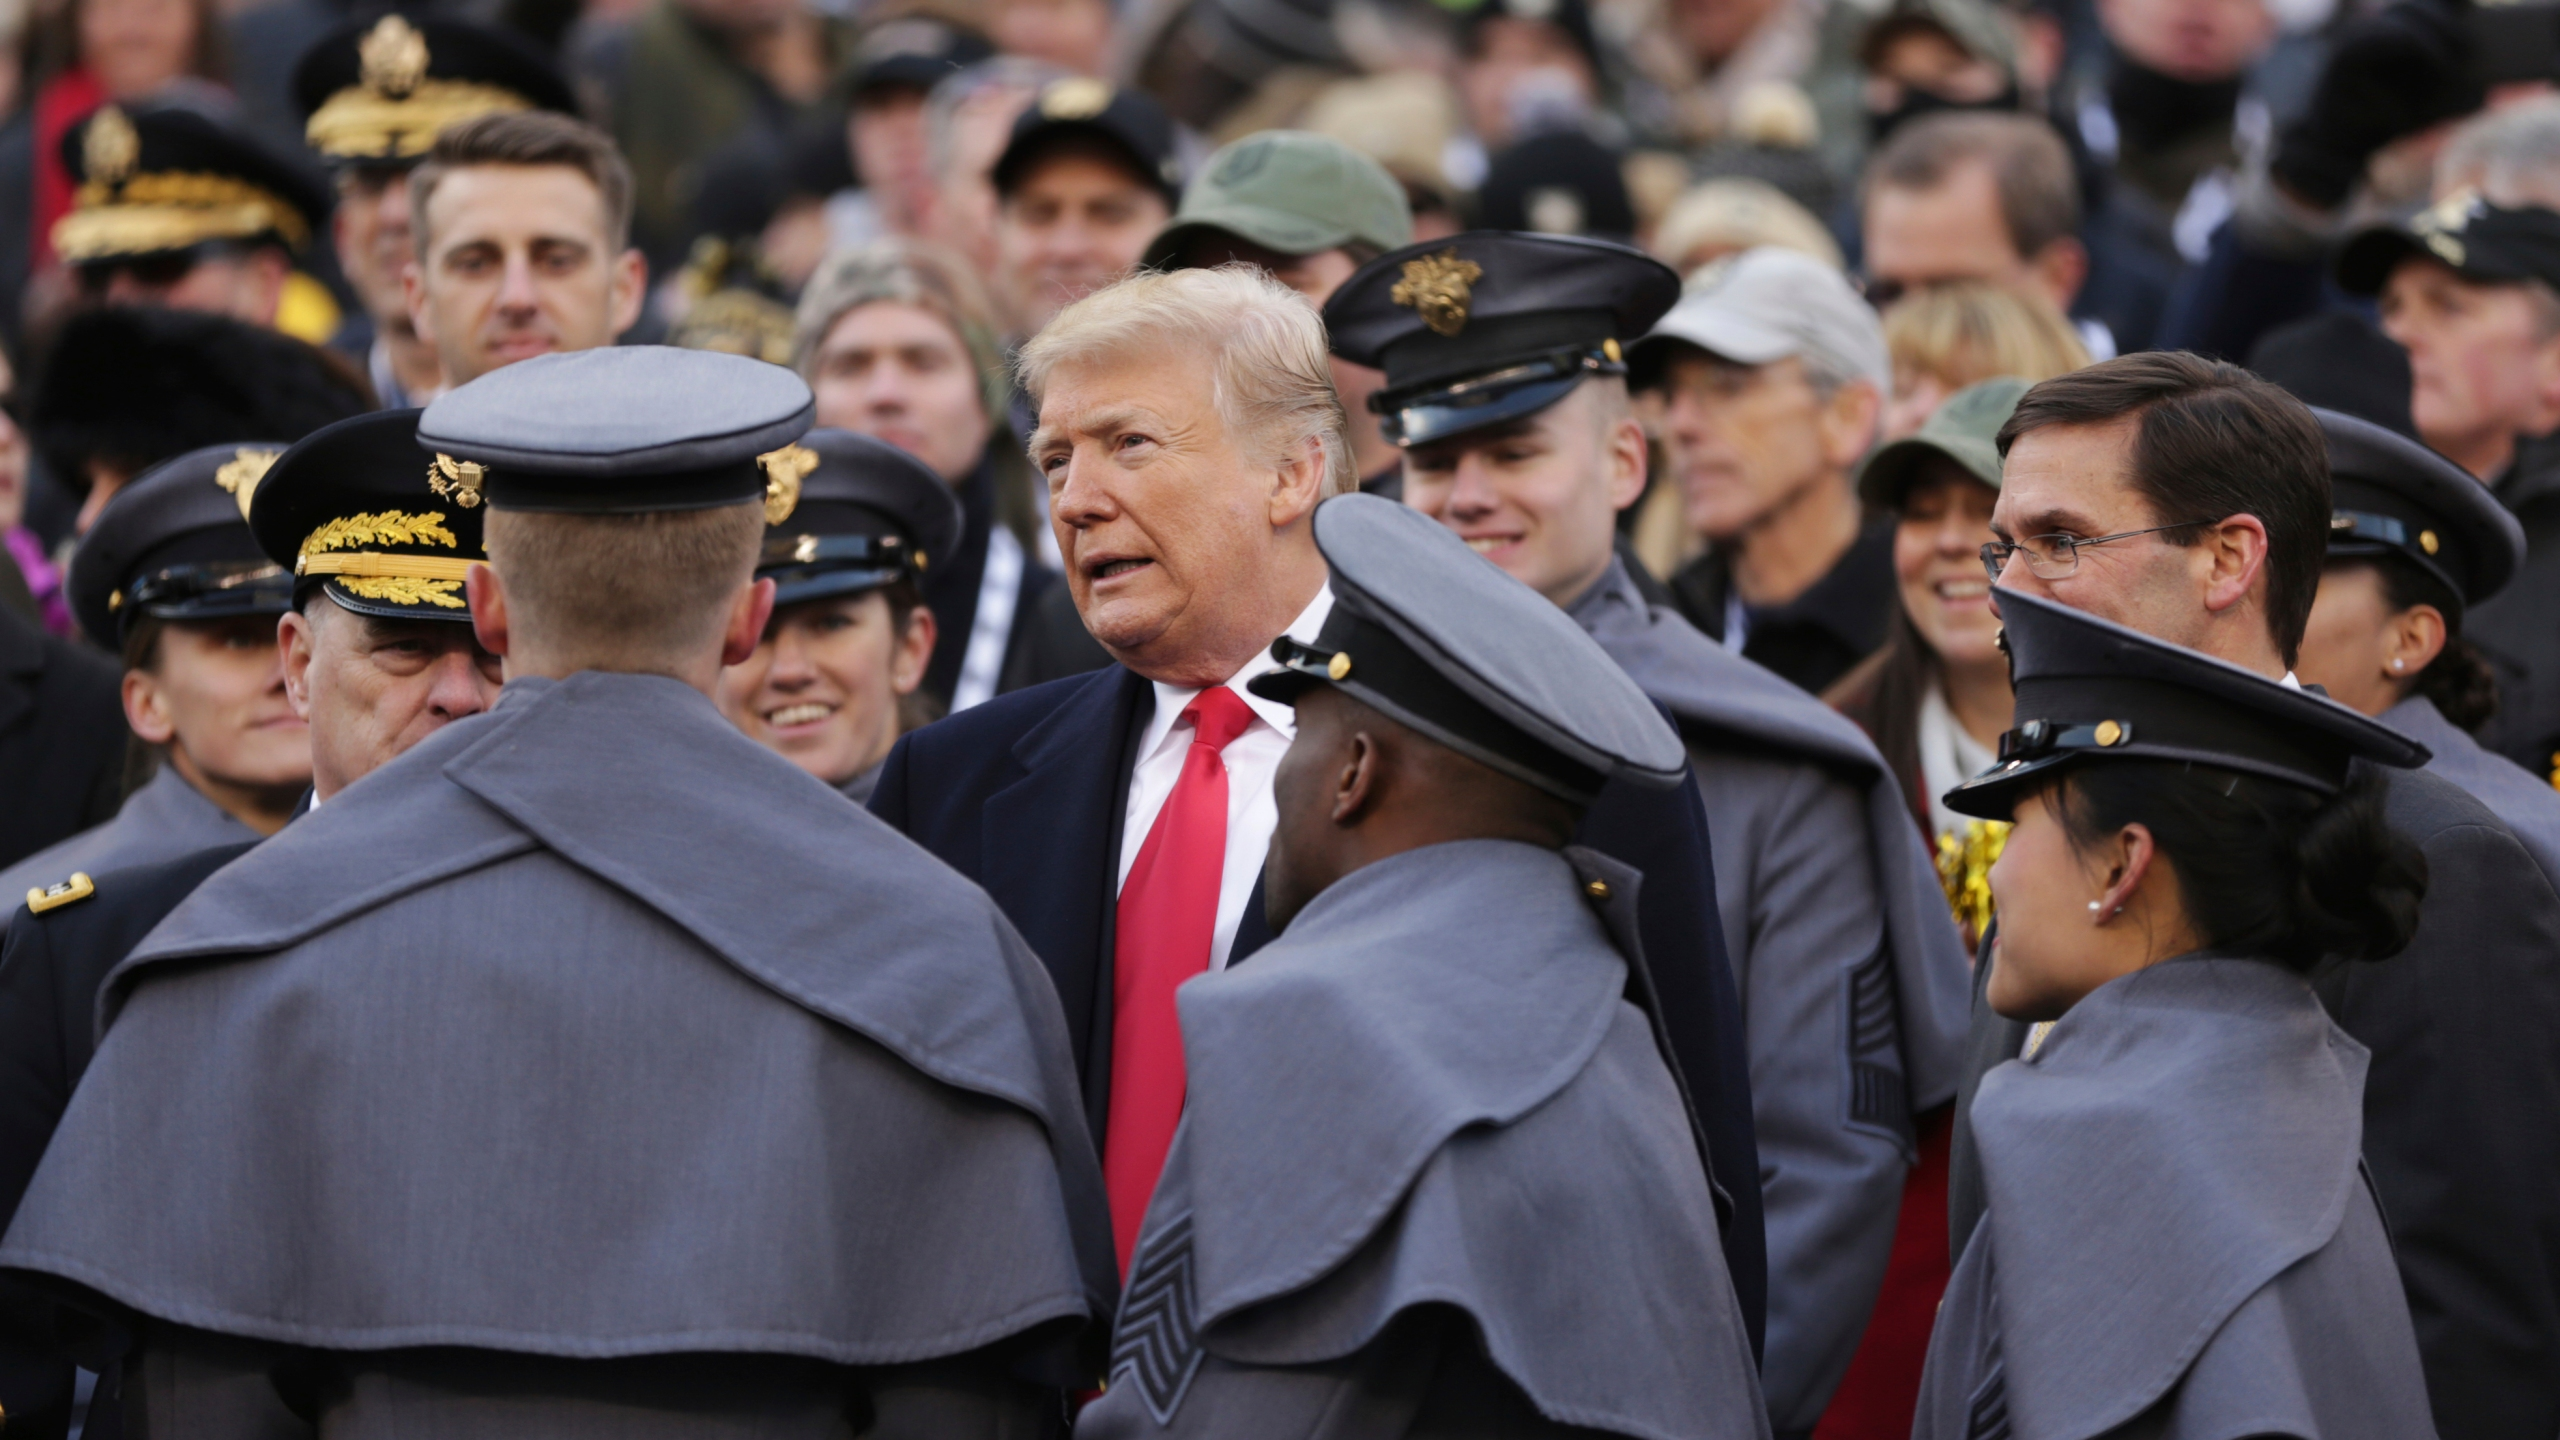 Trump_Navy_Army_Football_79527-159532.jpg36207671